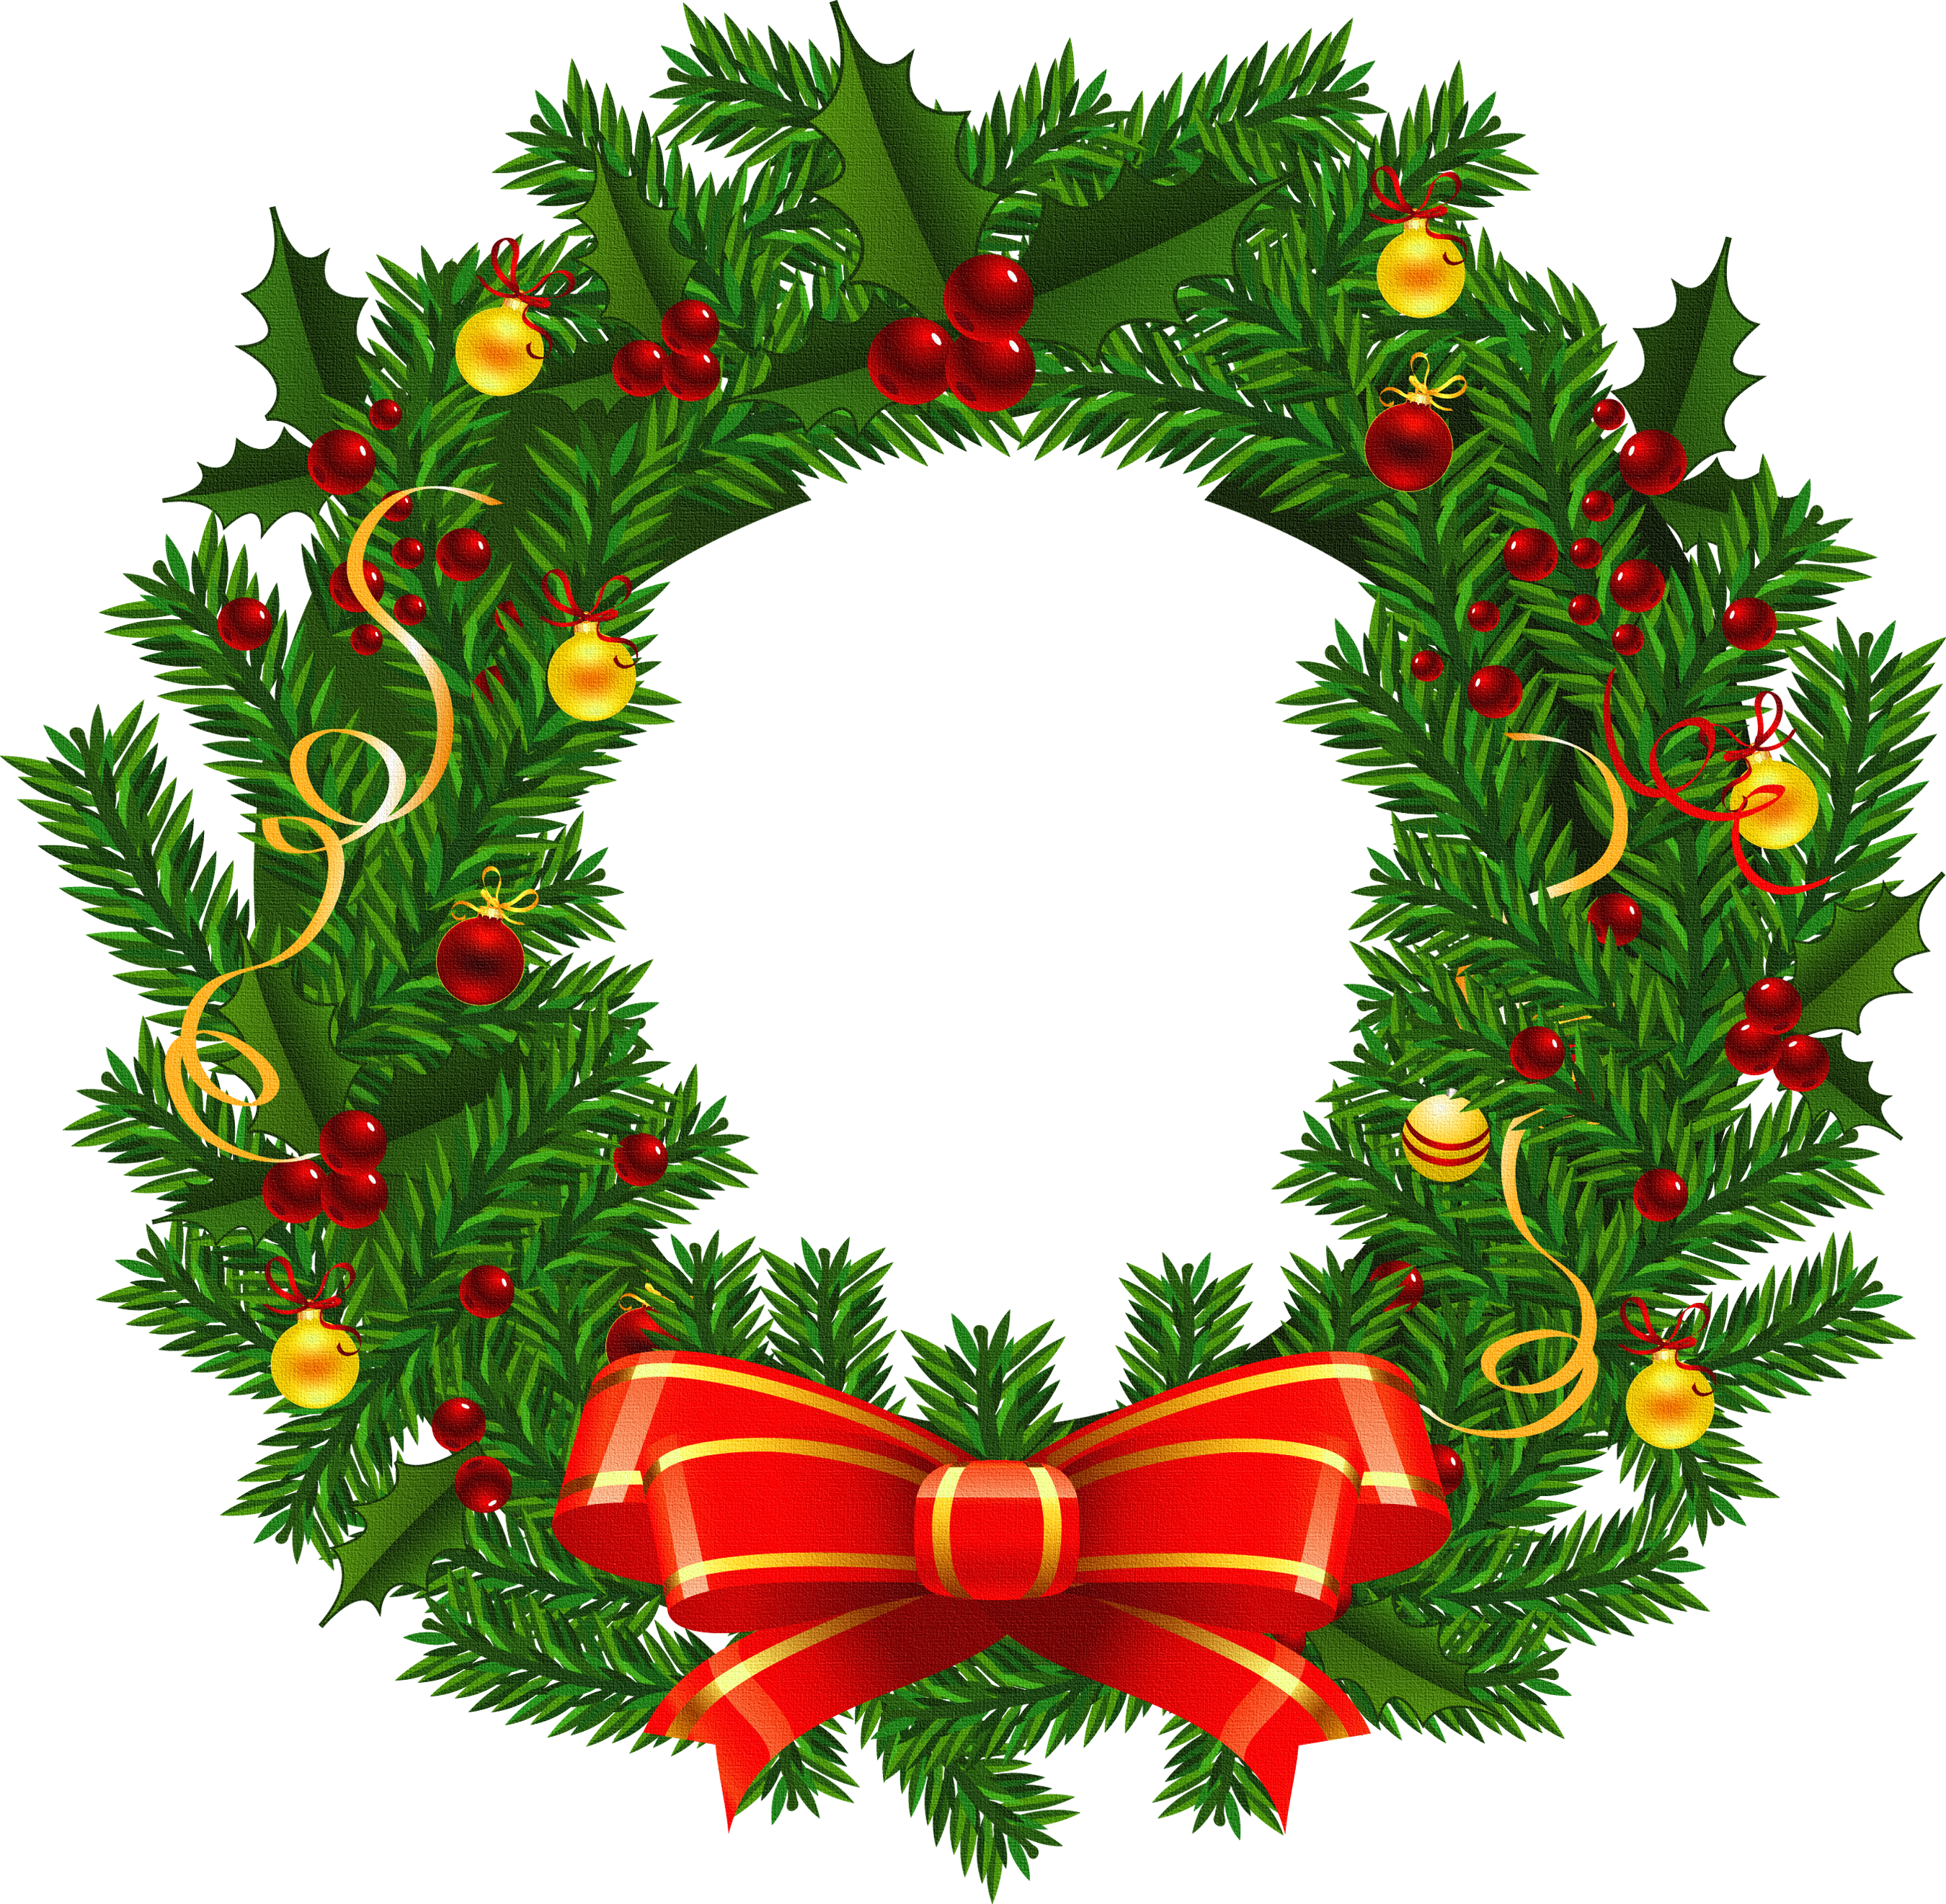 2700x2642 Christmas Wreath Clip Art Free Vector Download 214 390 Reef